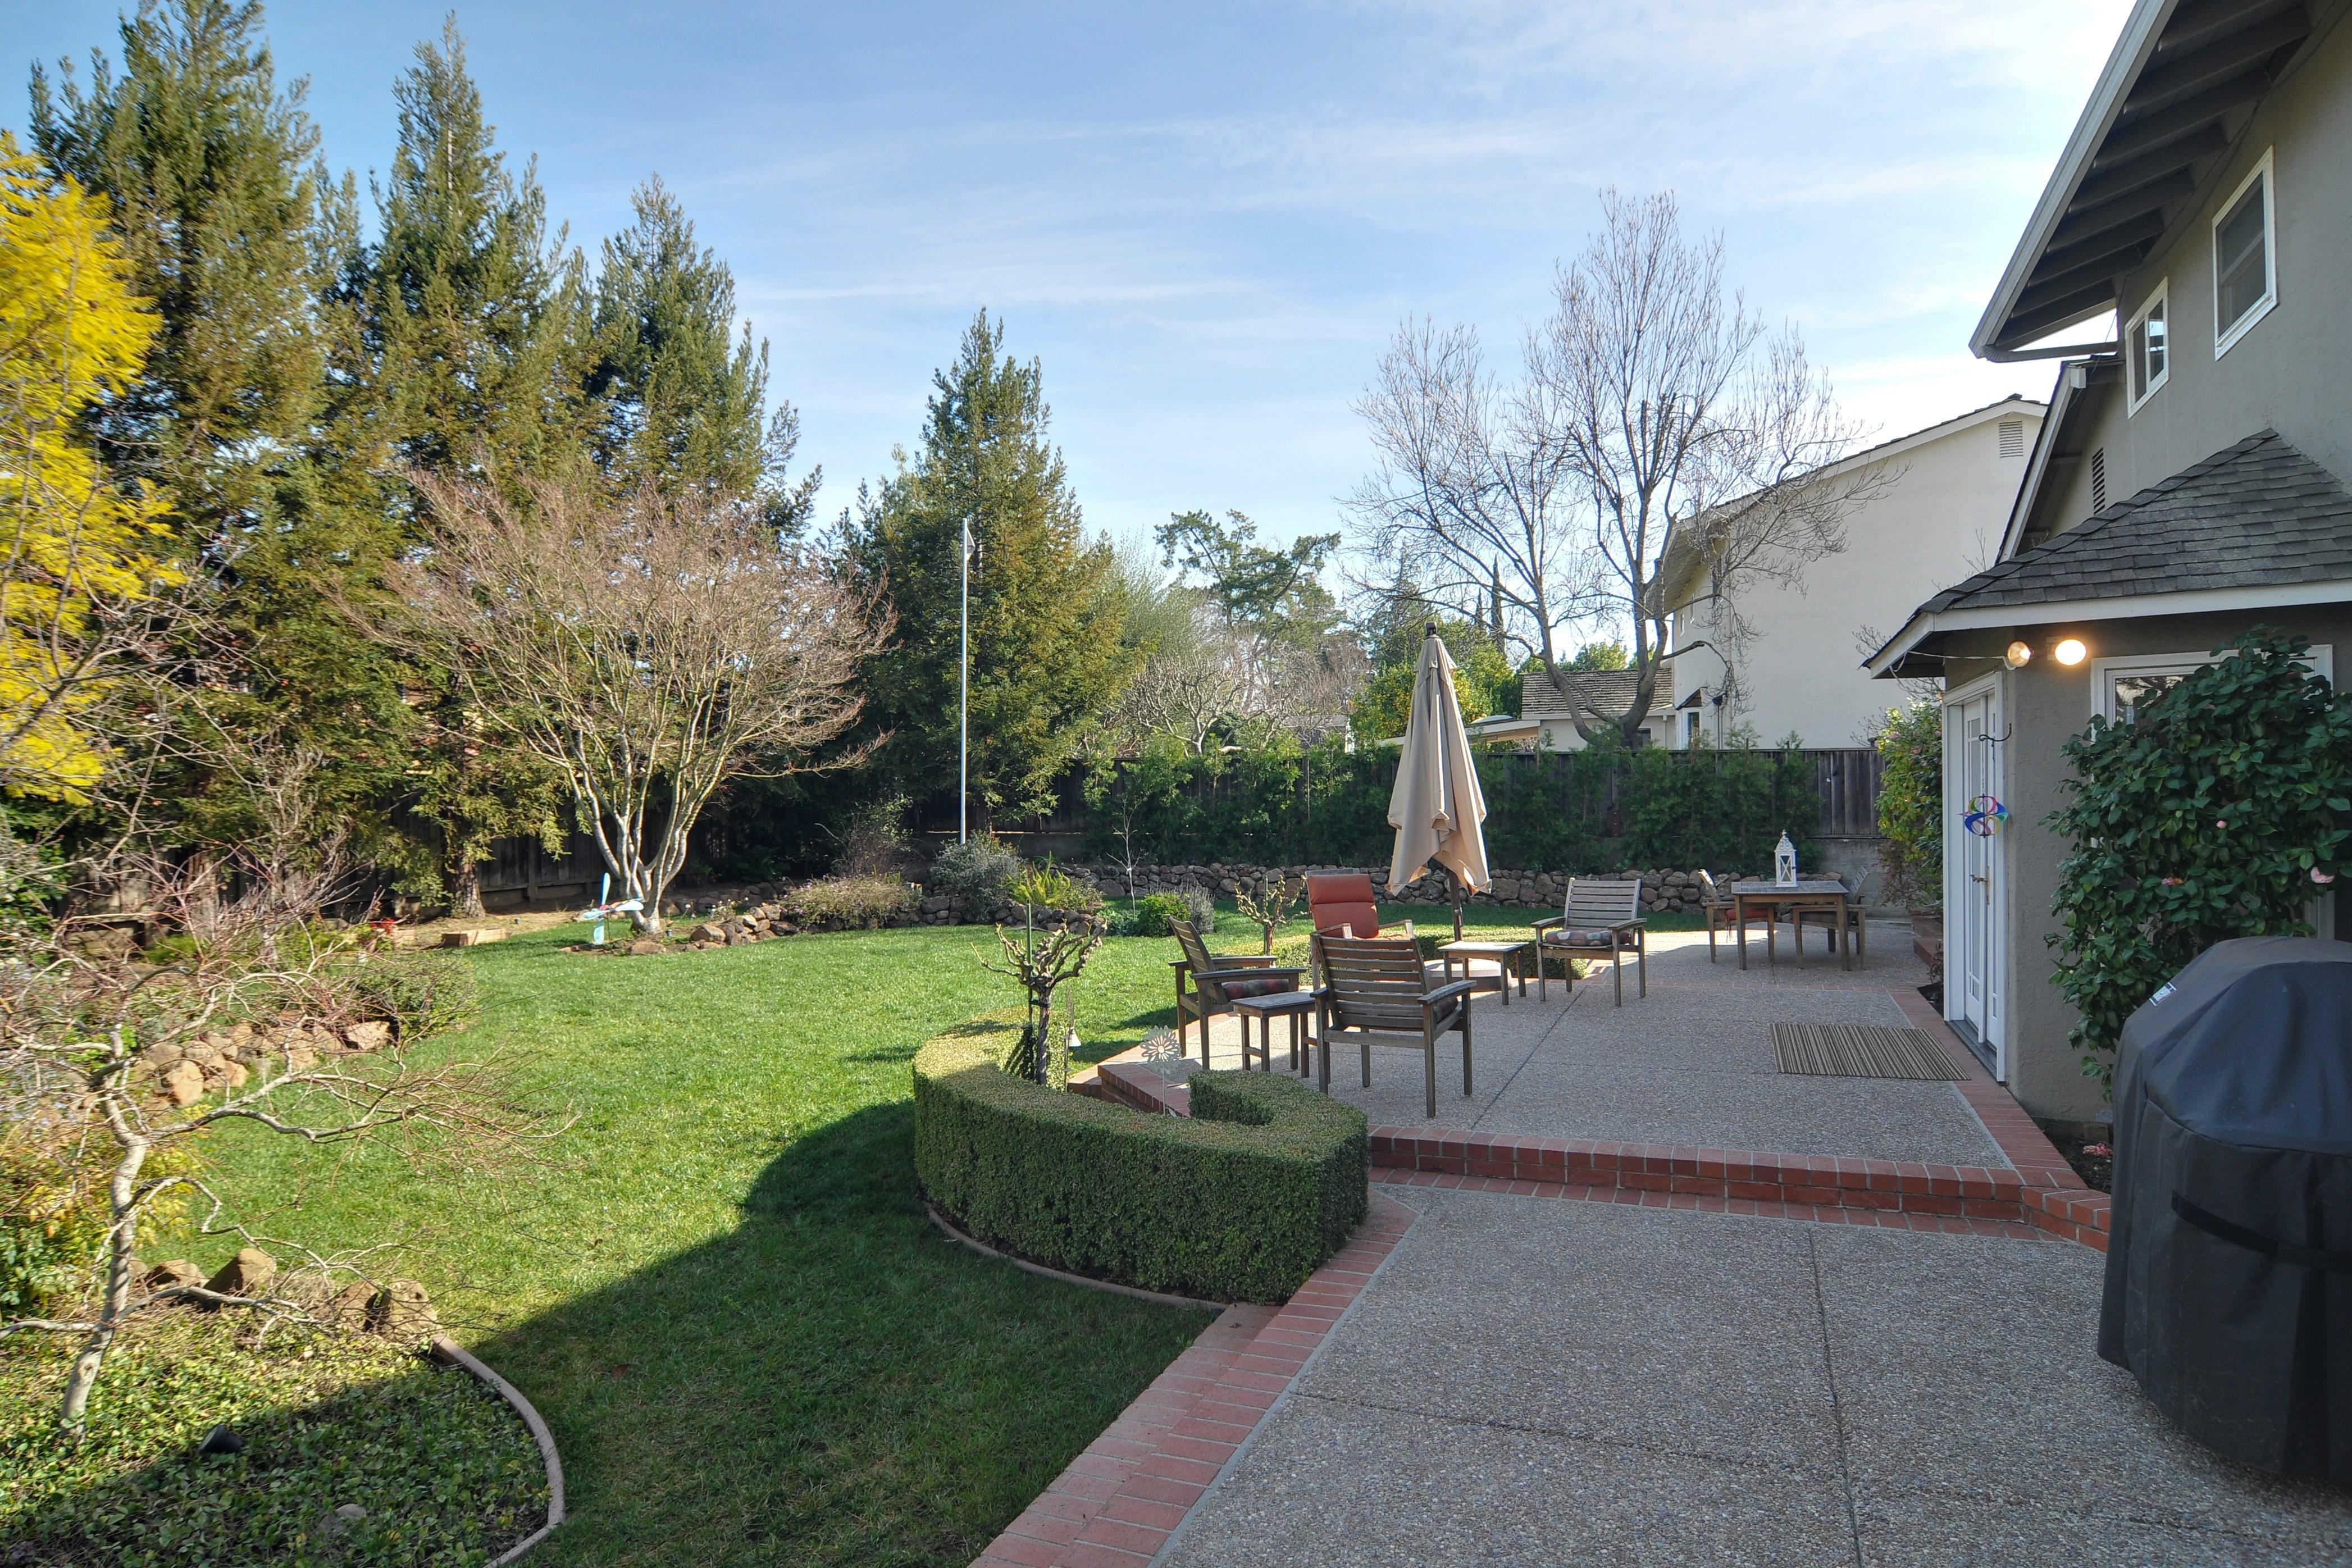 031 Backyard - Exquisite, expansive, remodeled Belwood home - 127 Belhaven Drive, Los Gatos